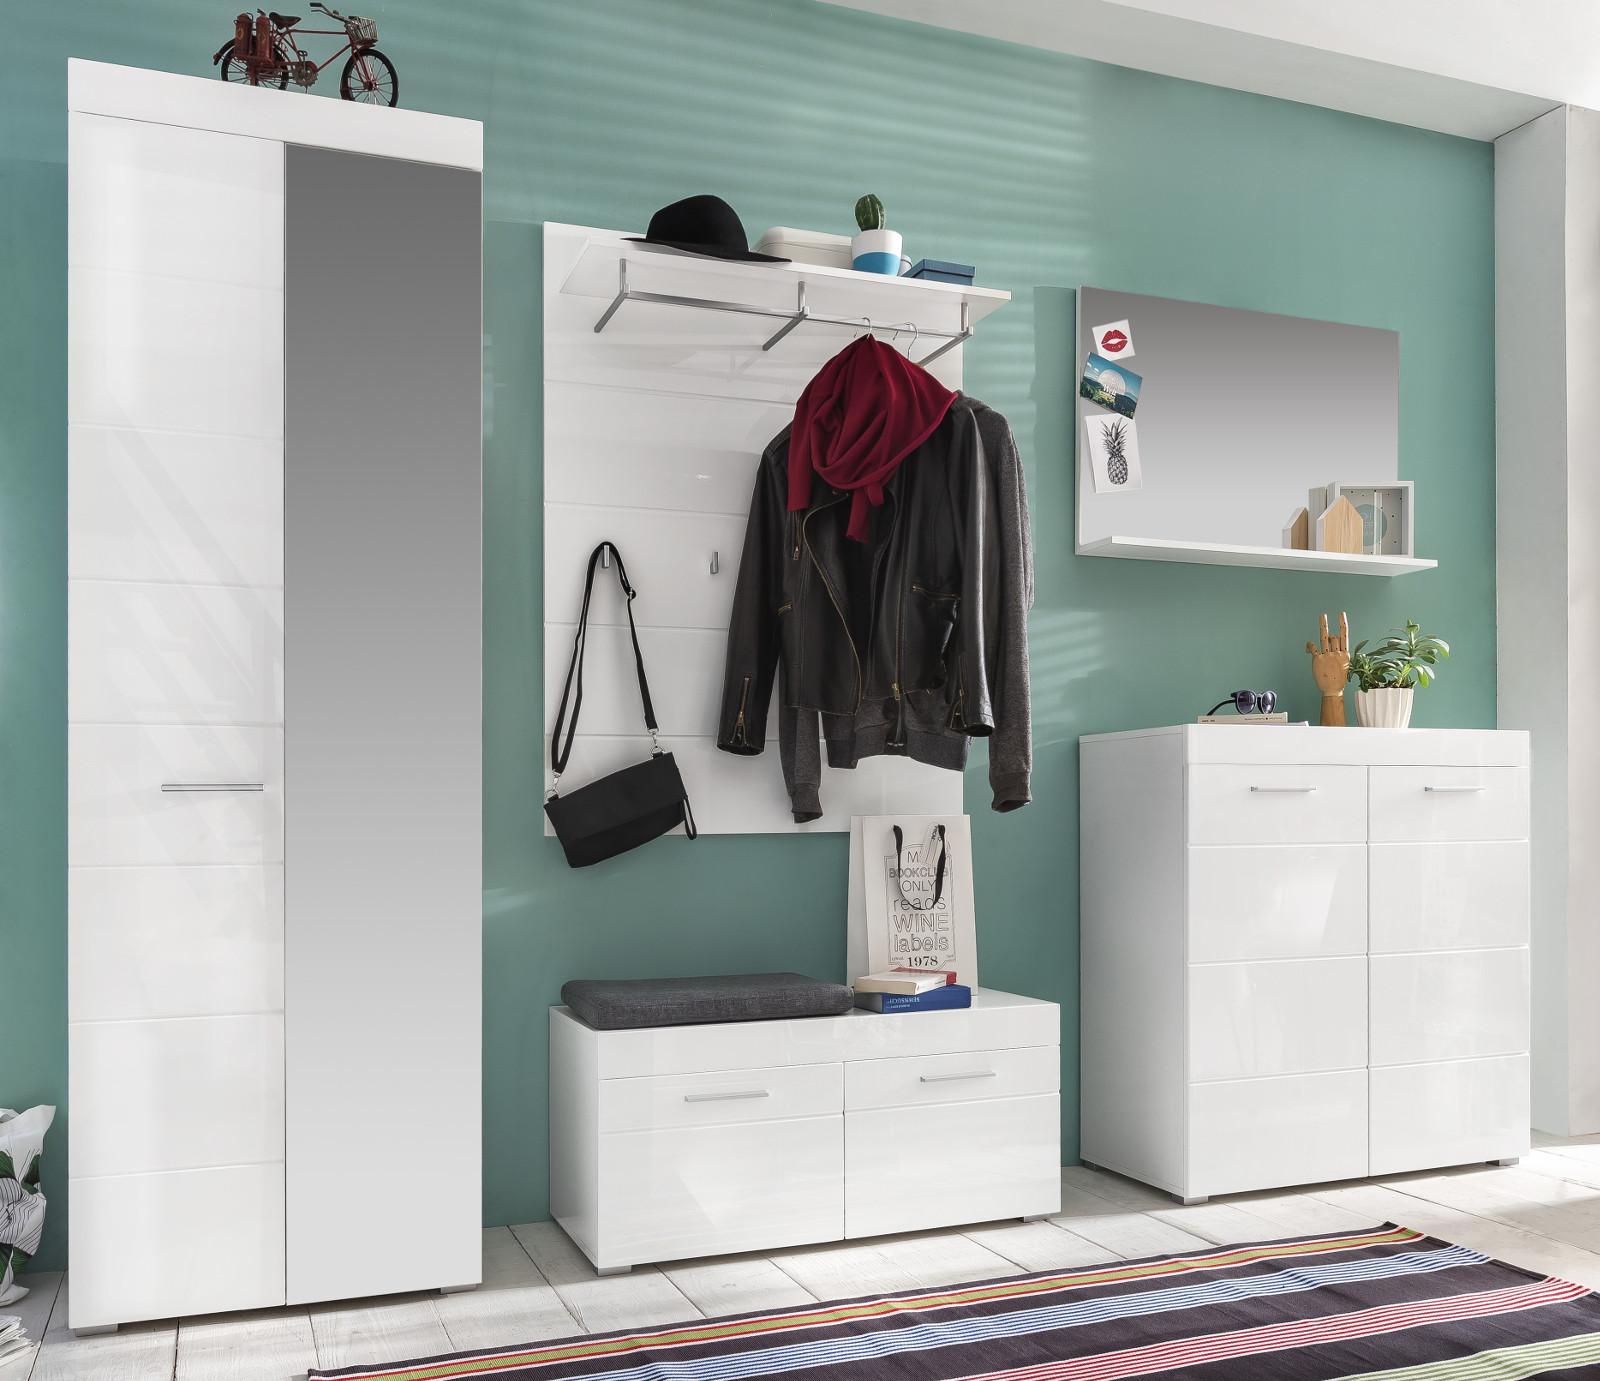 Garderobenpaneel mit sitzbank garderobenpaneel mit - Kompaktgarderobe ikea ...